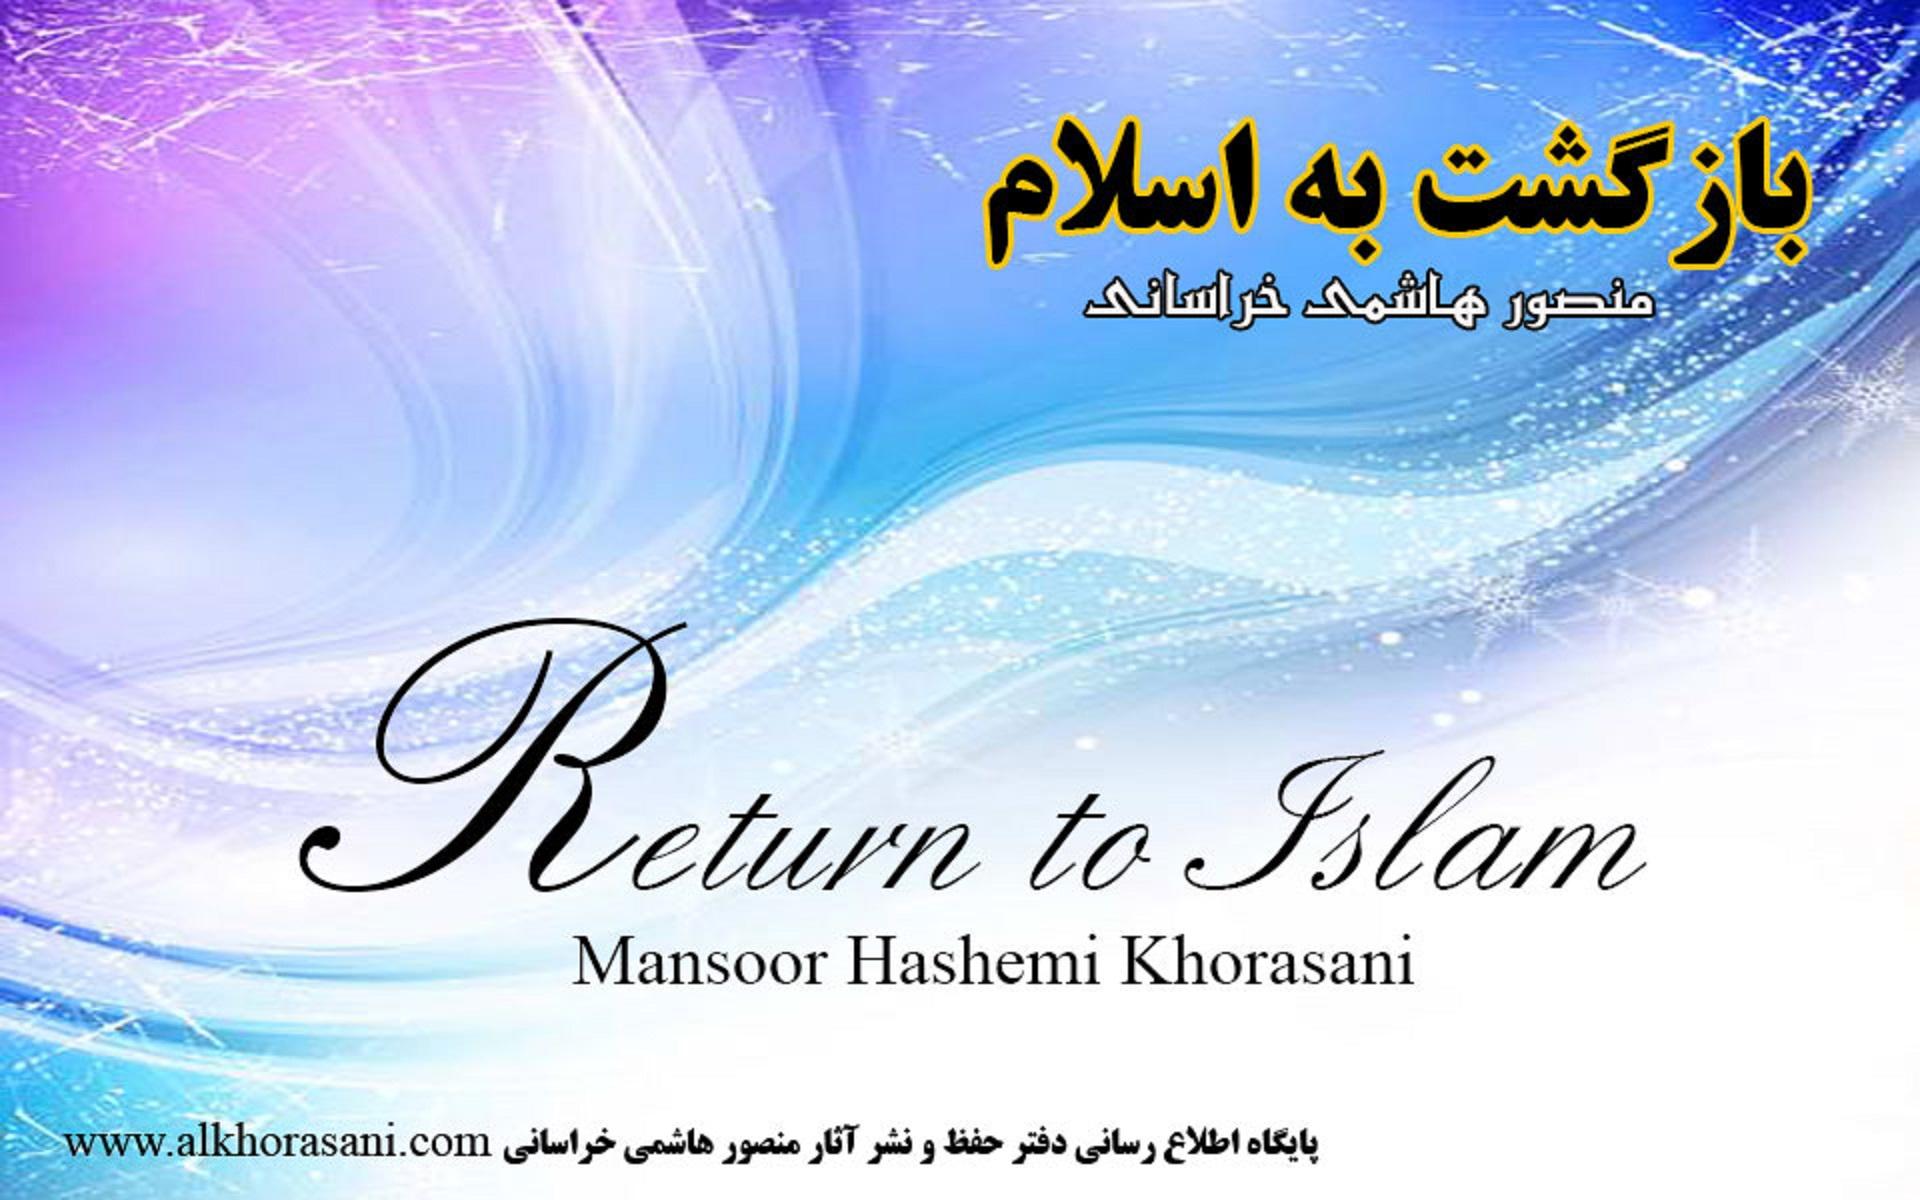 اسلام خالص و کامل